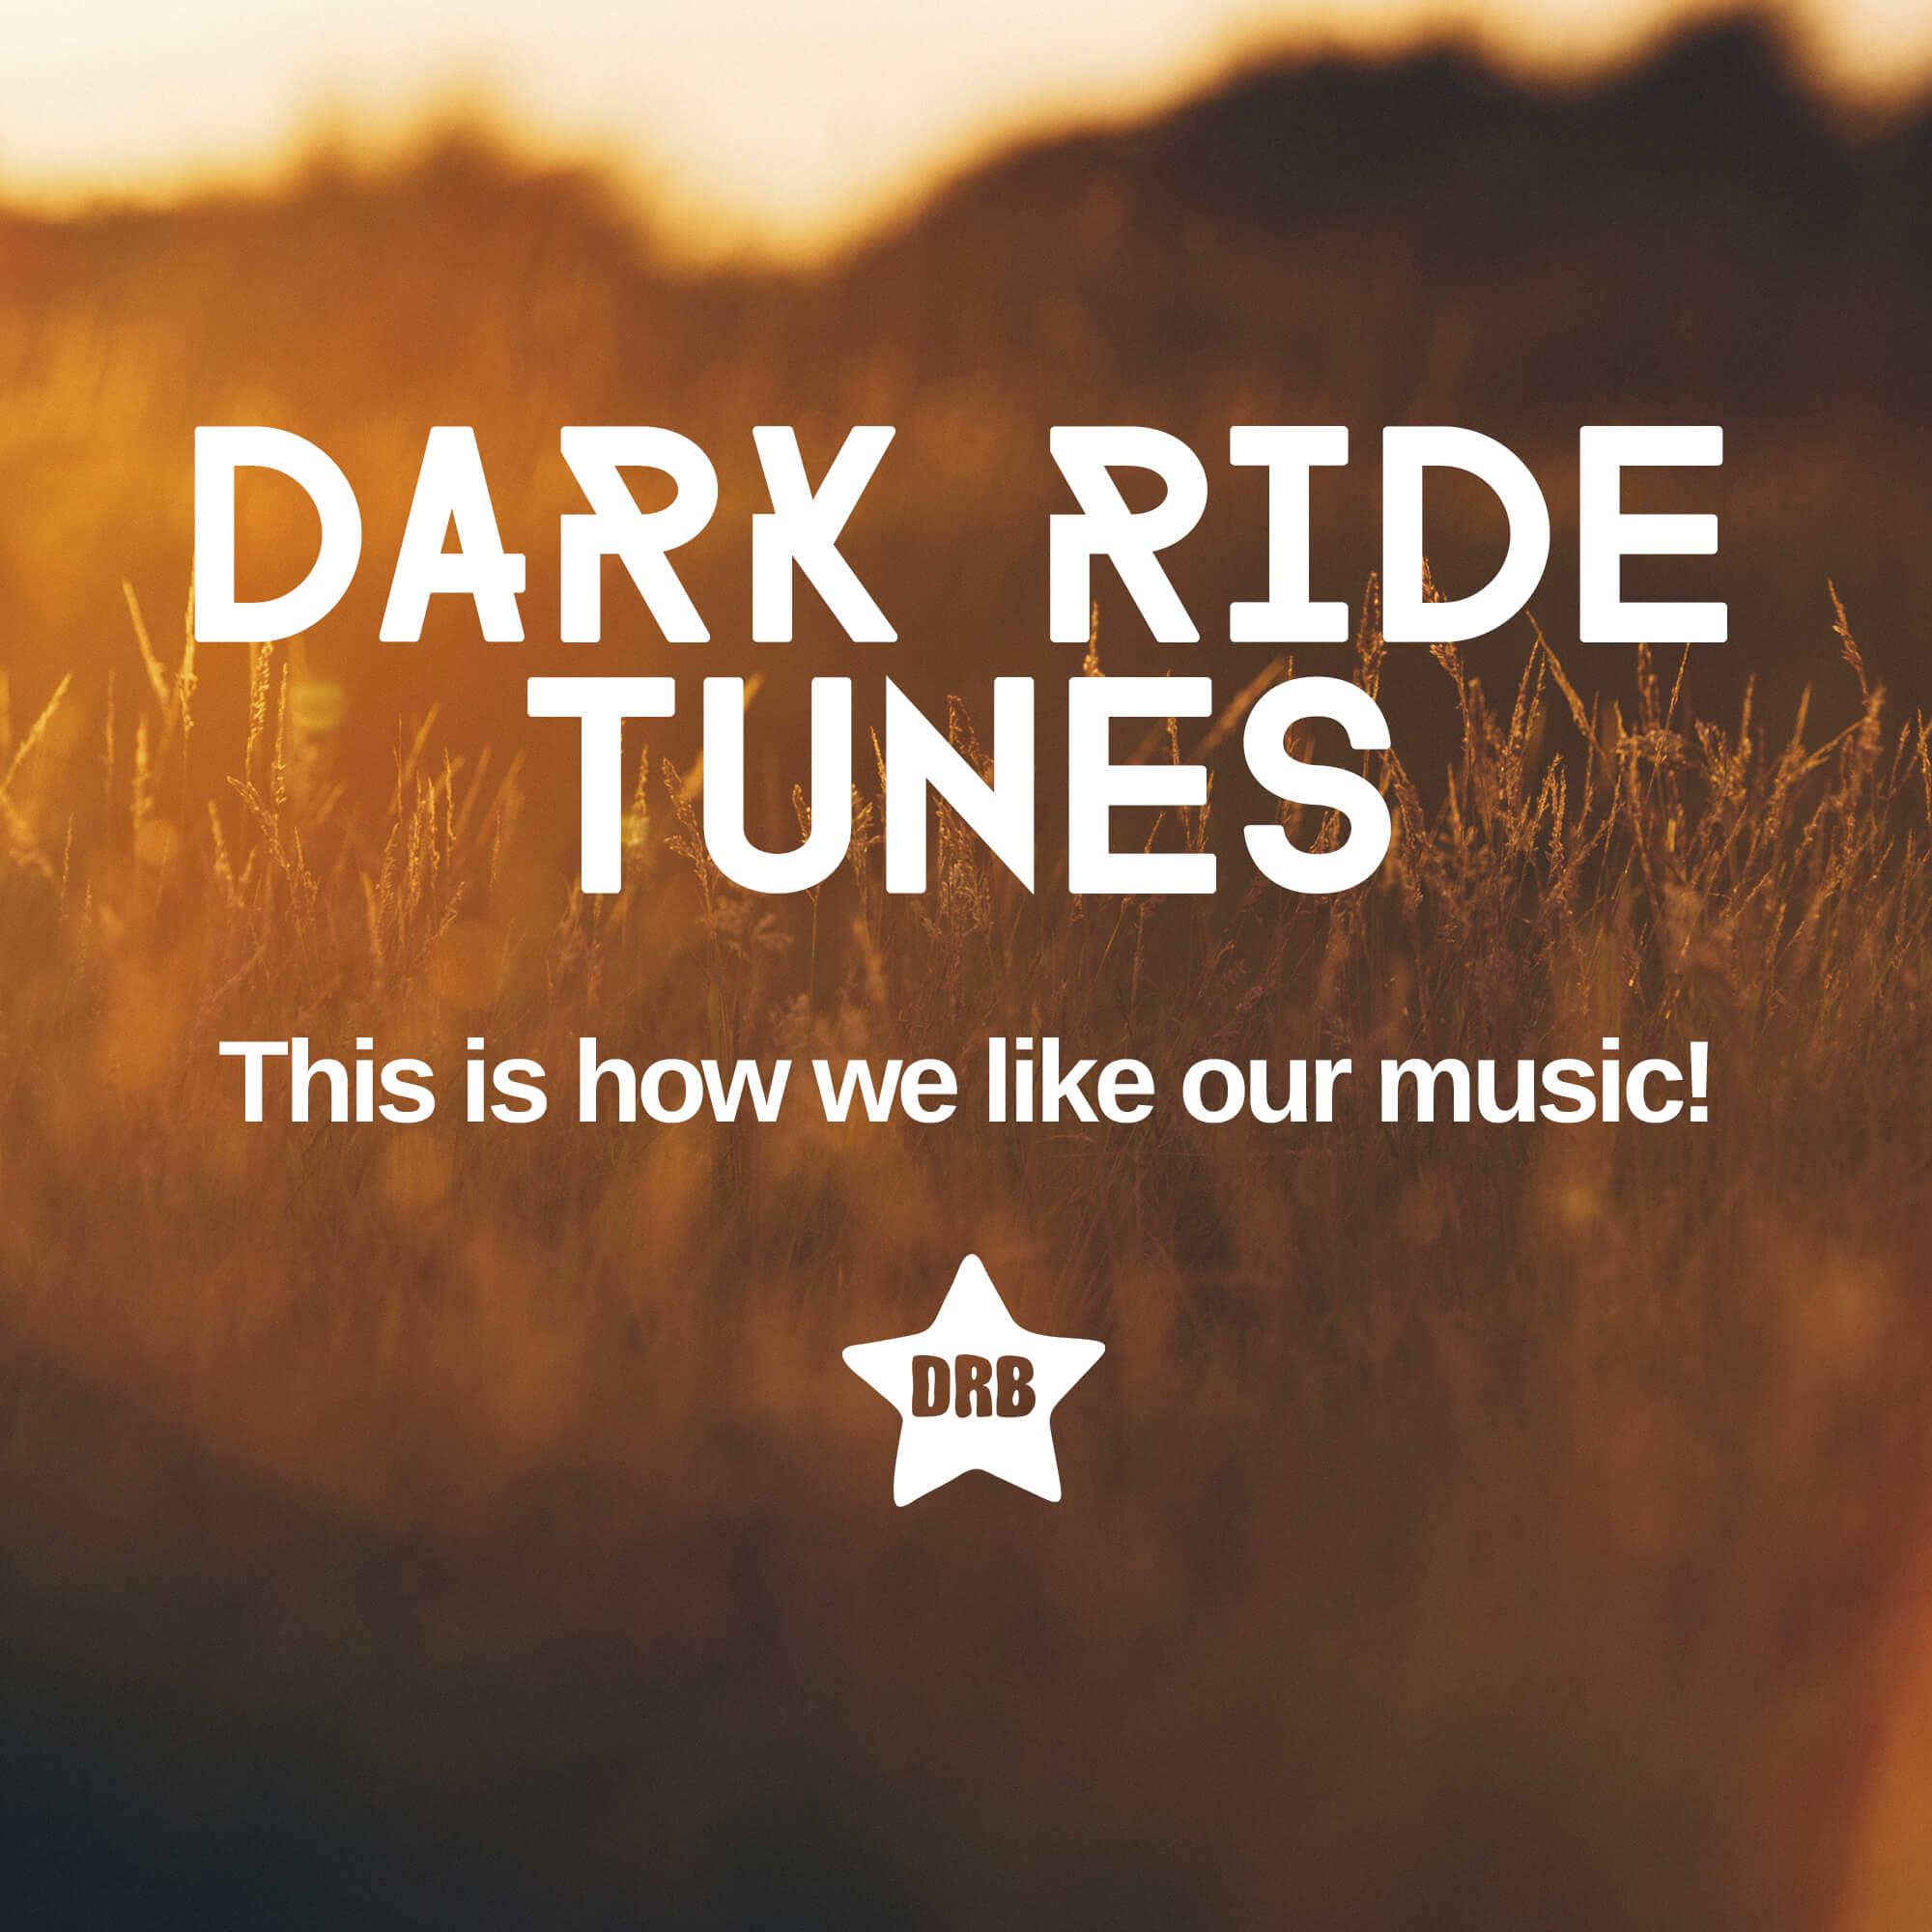 Dark Ride Brothers Spotify Playlist - Dark Ride Tunes